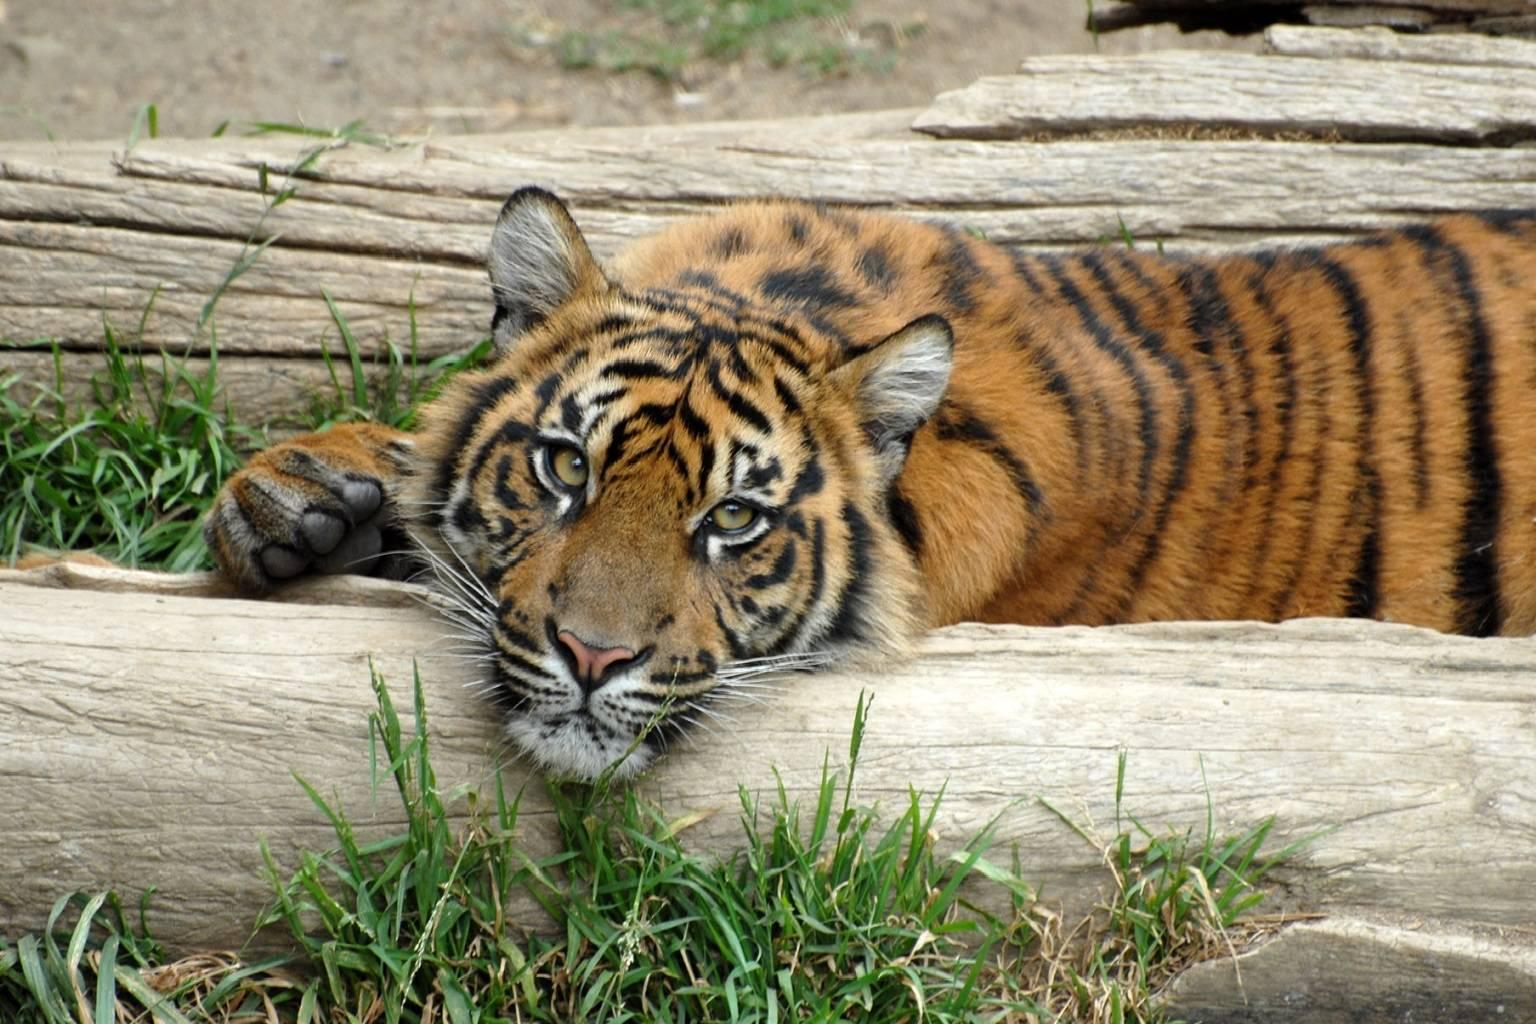 Kitty on a log